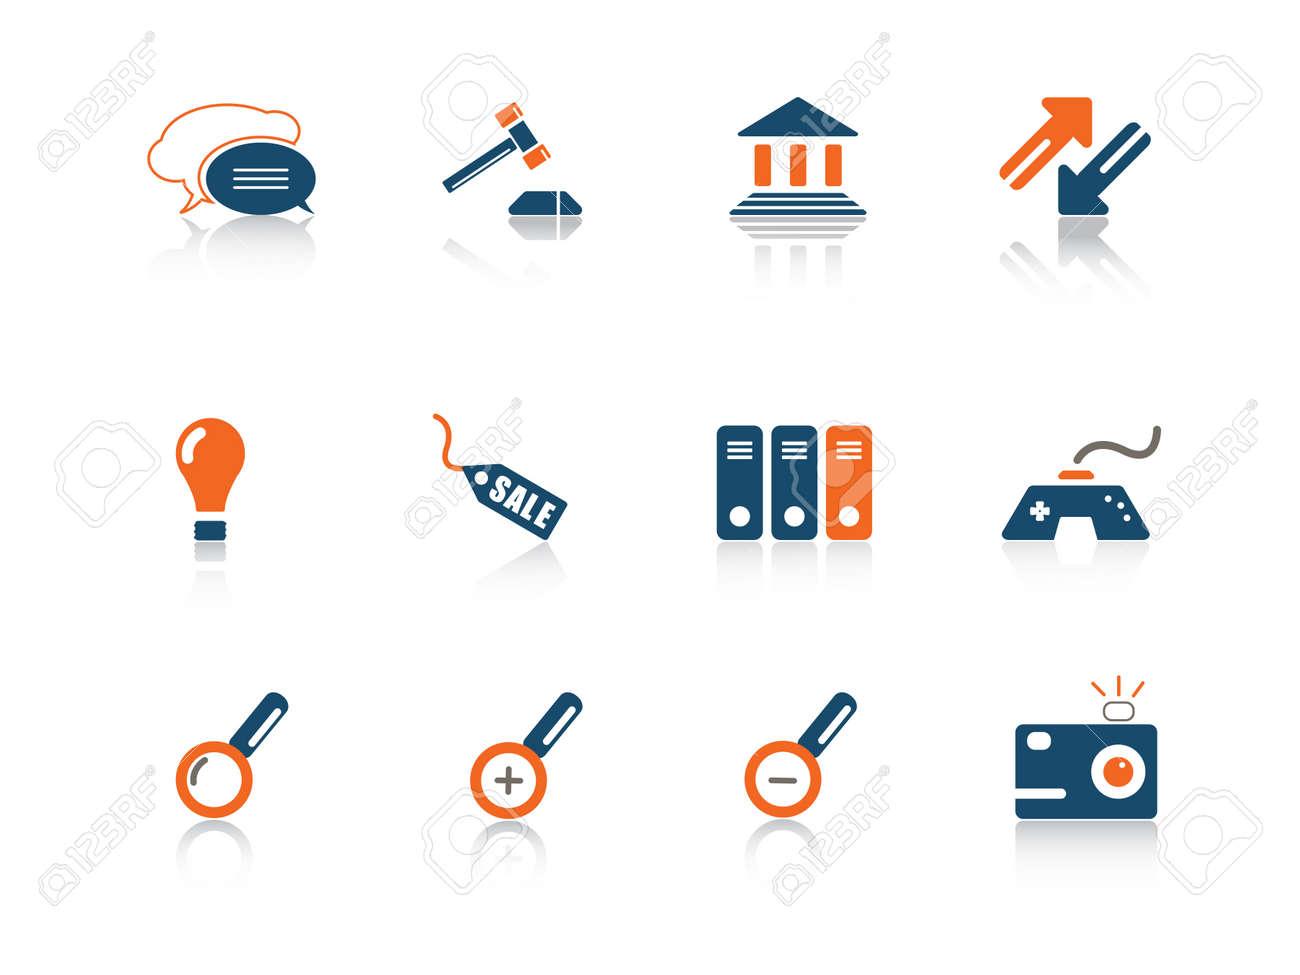 Web icon blue orange series 5 Stock Vector - 3792644